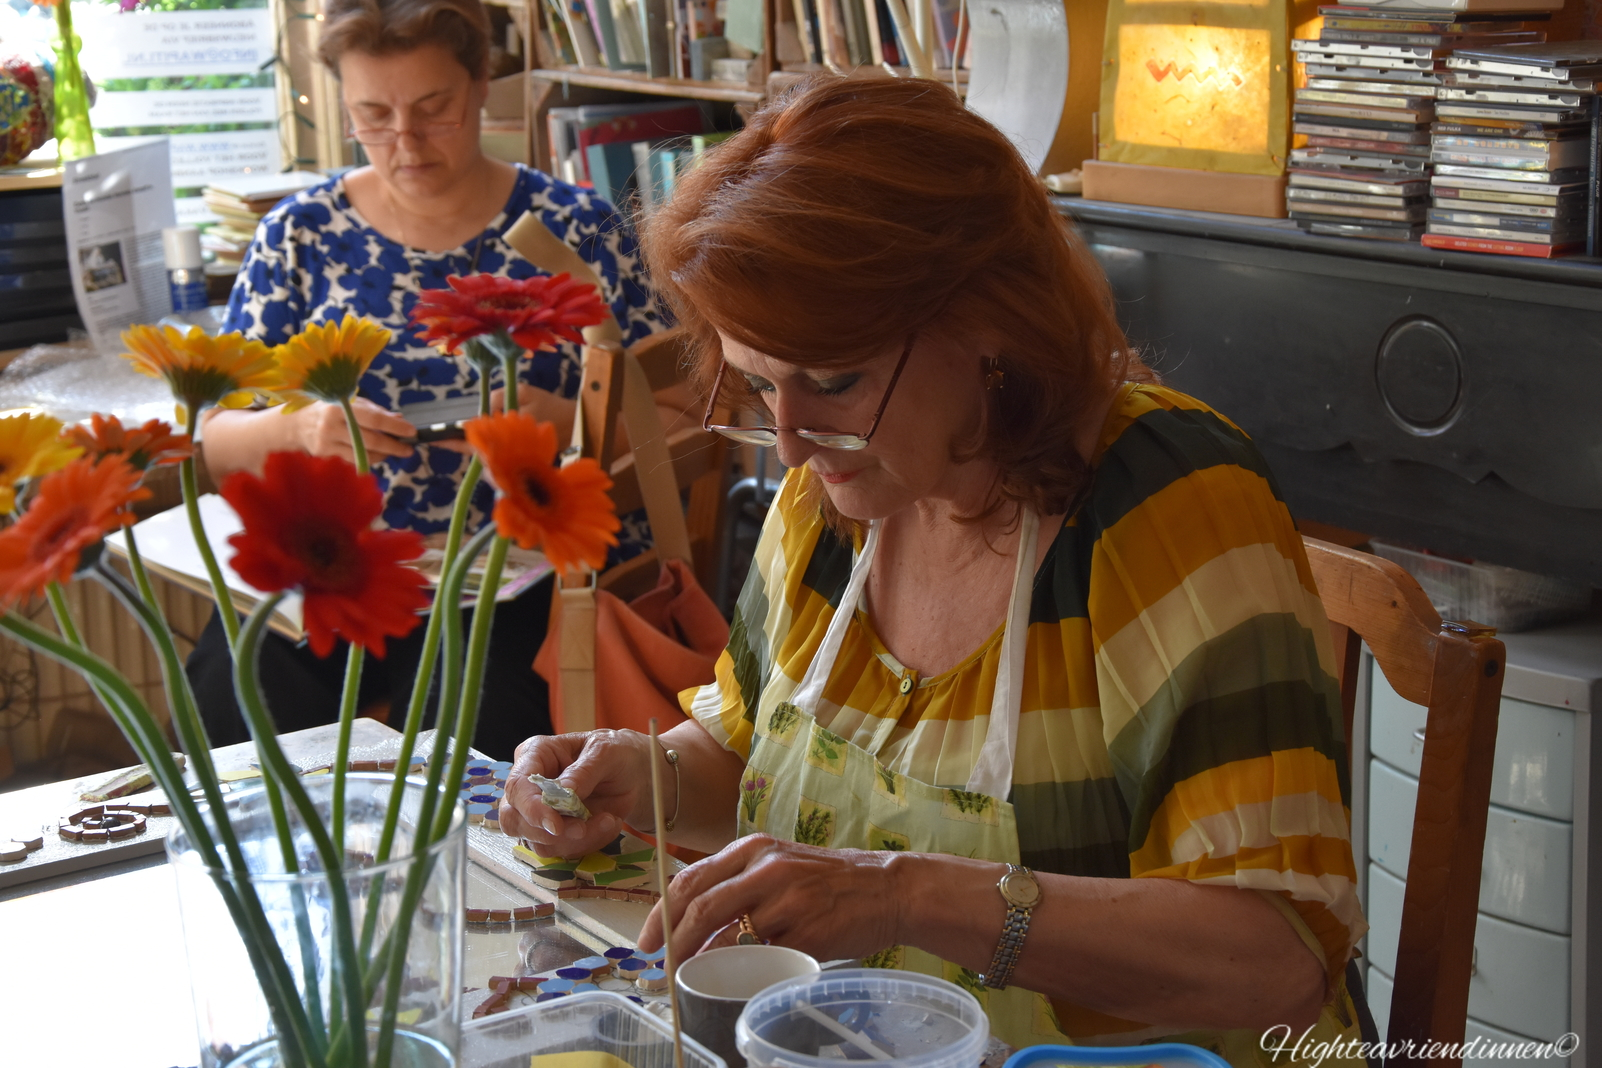 Wapiti, high tea vriendinnen, workshops